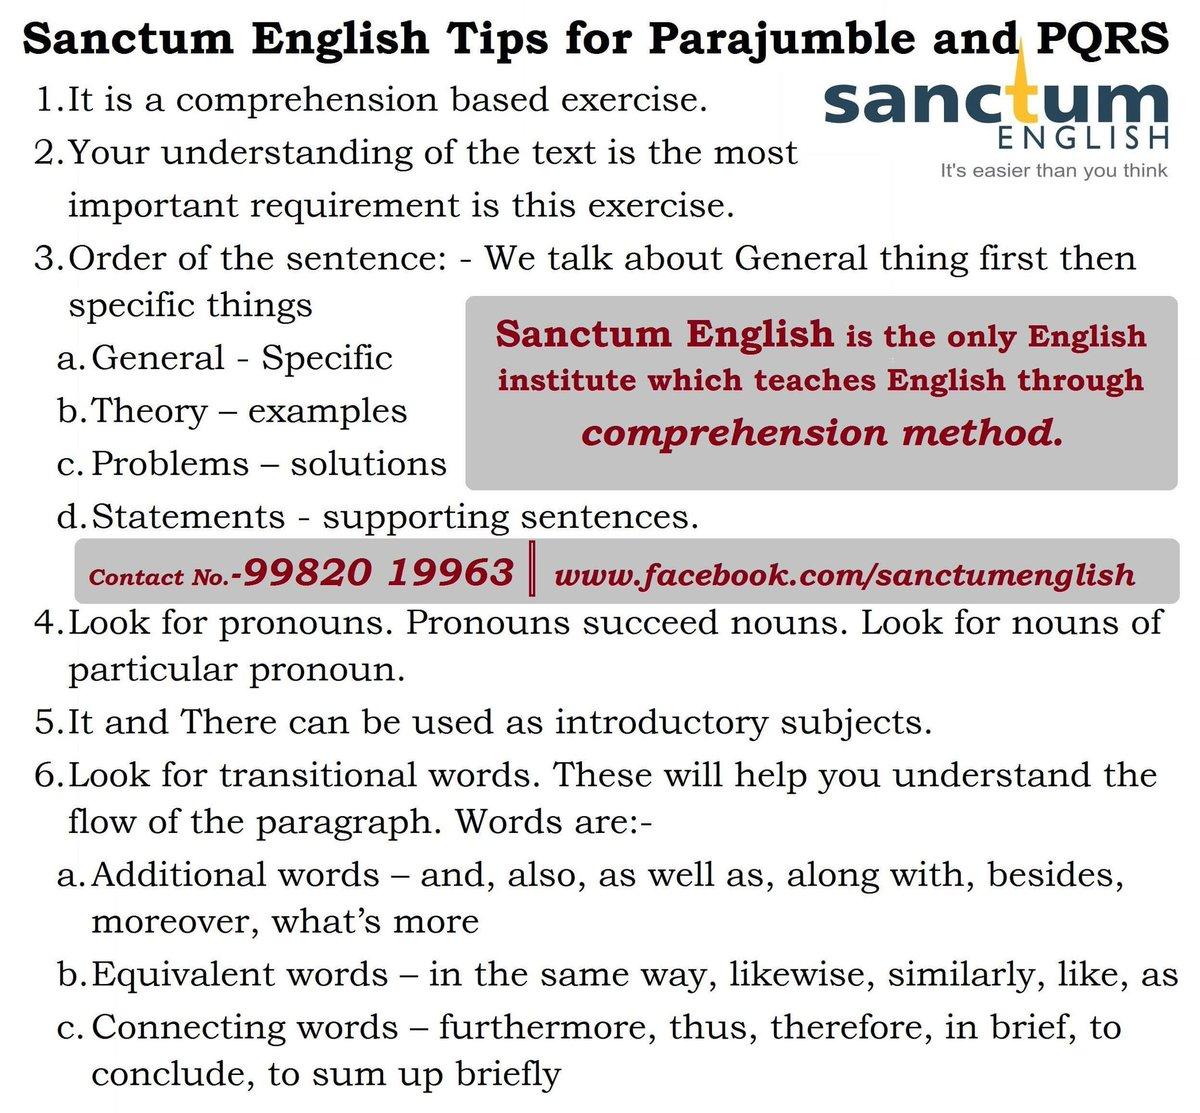 Languagelearning English Tips For Pqrs Parajumble Sentencearrangement Sbi Ibps Po Clerk Ssc Cglpic Twitter Iboymp4g7f